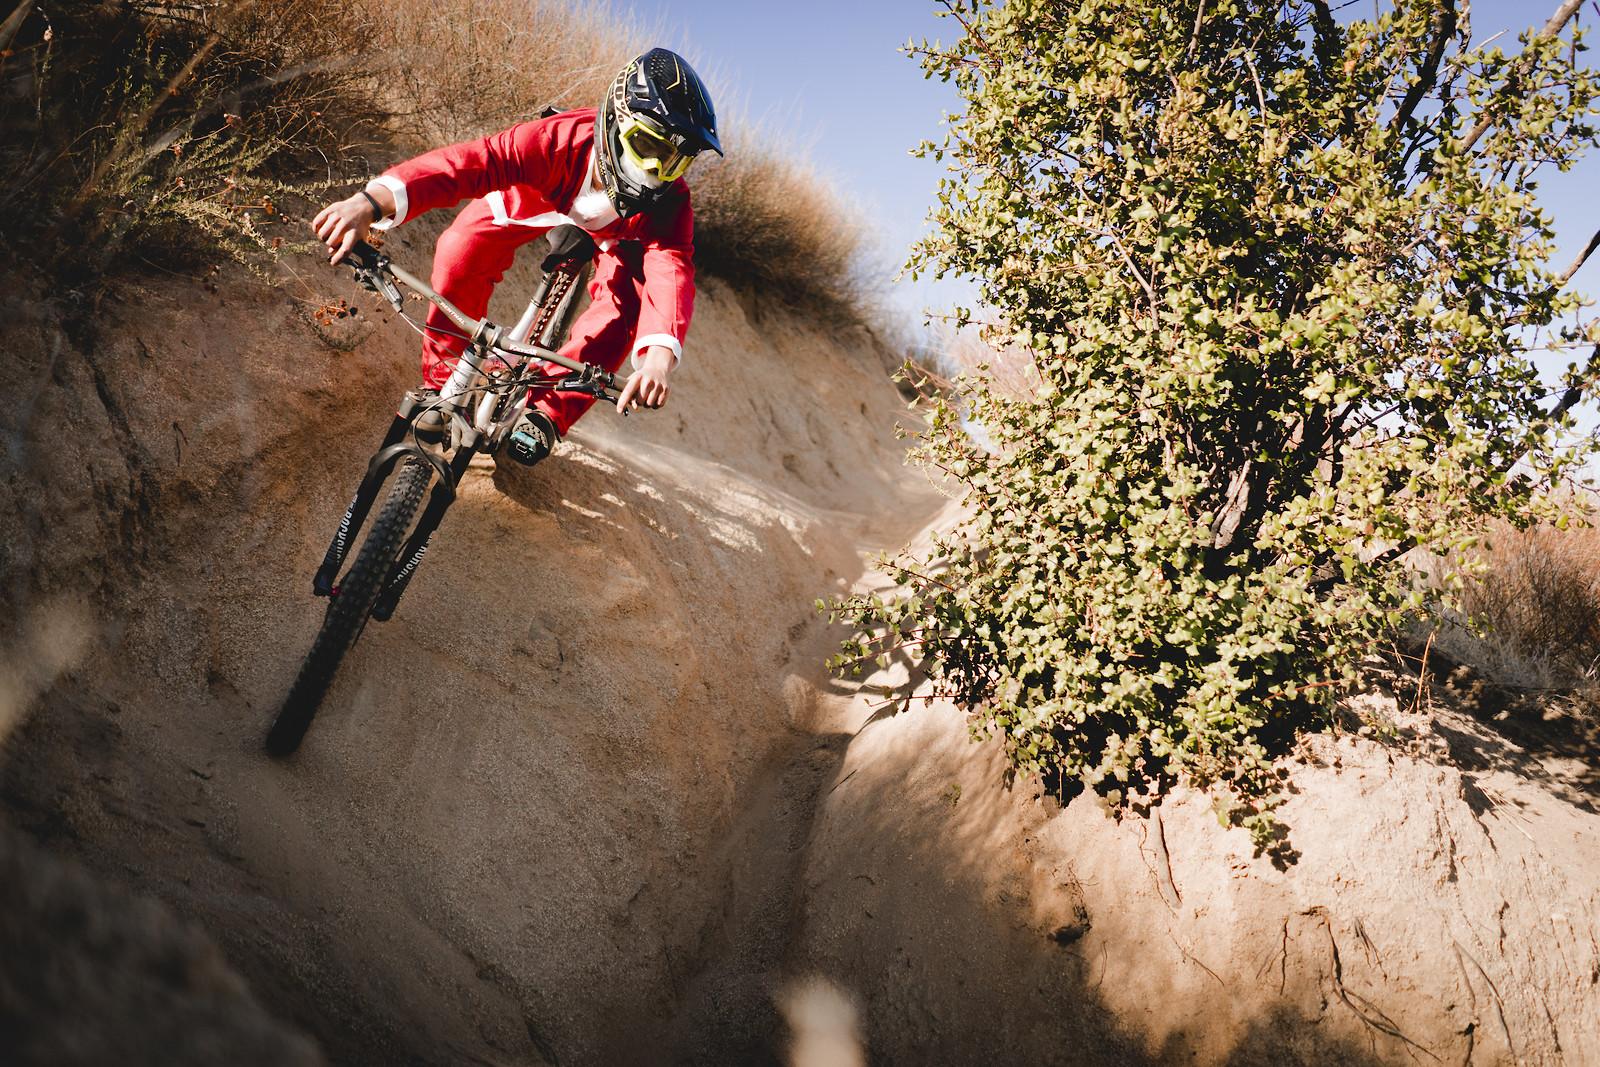 DSC08646 - sammcneesphotography - Mountain Biking Pictures - Vital MTB